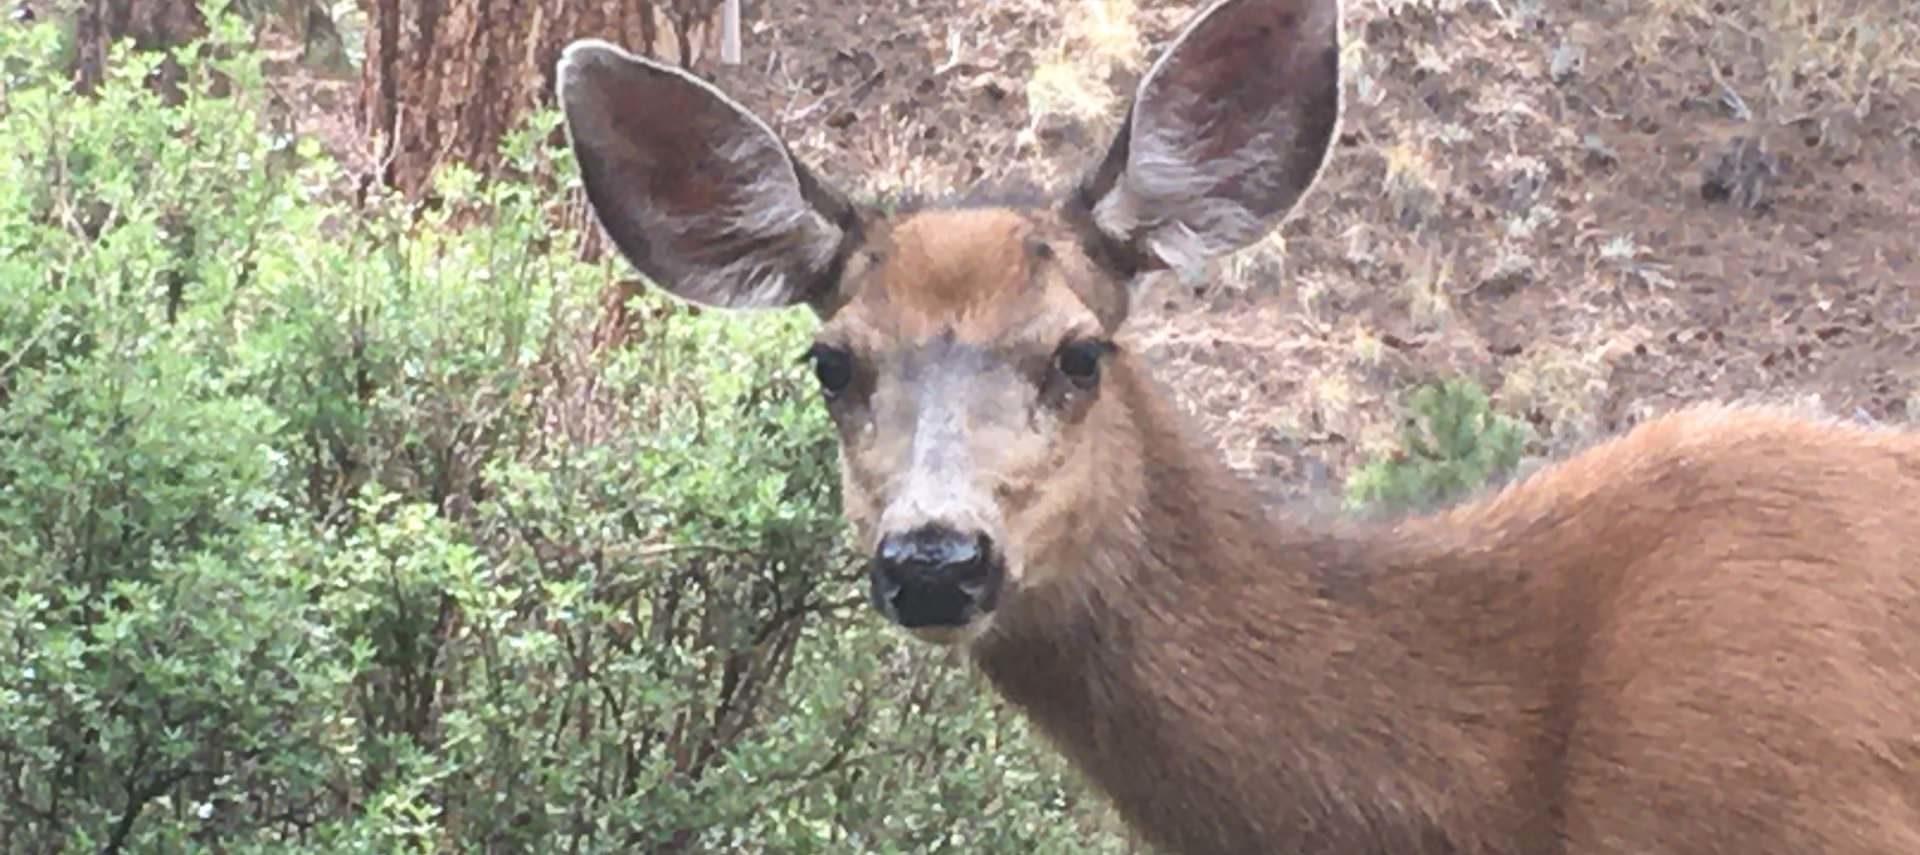 Close up view of doe standing near green shrubs